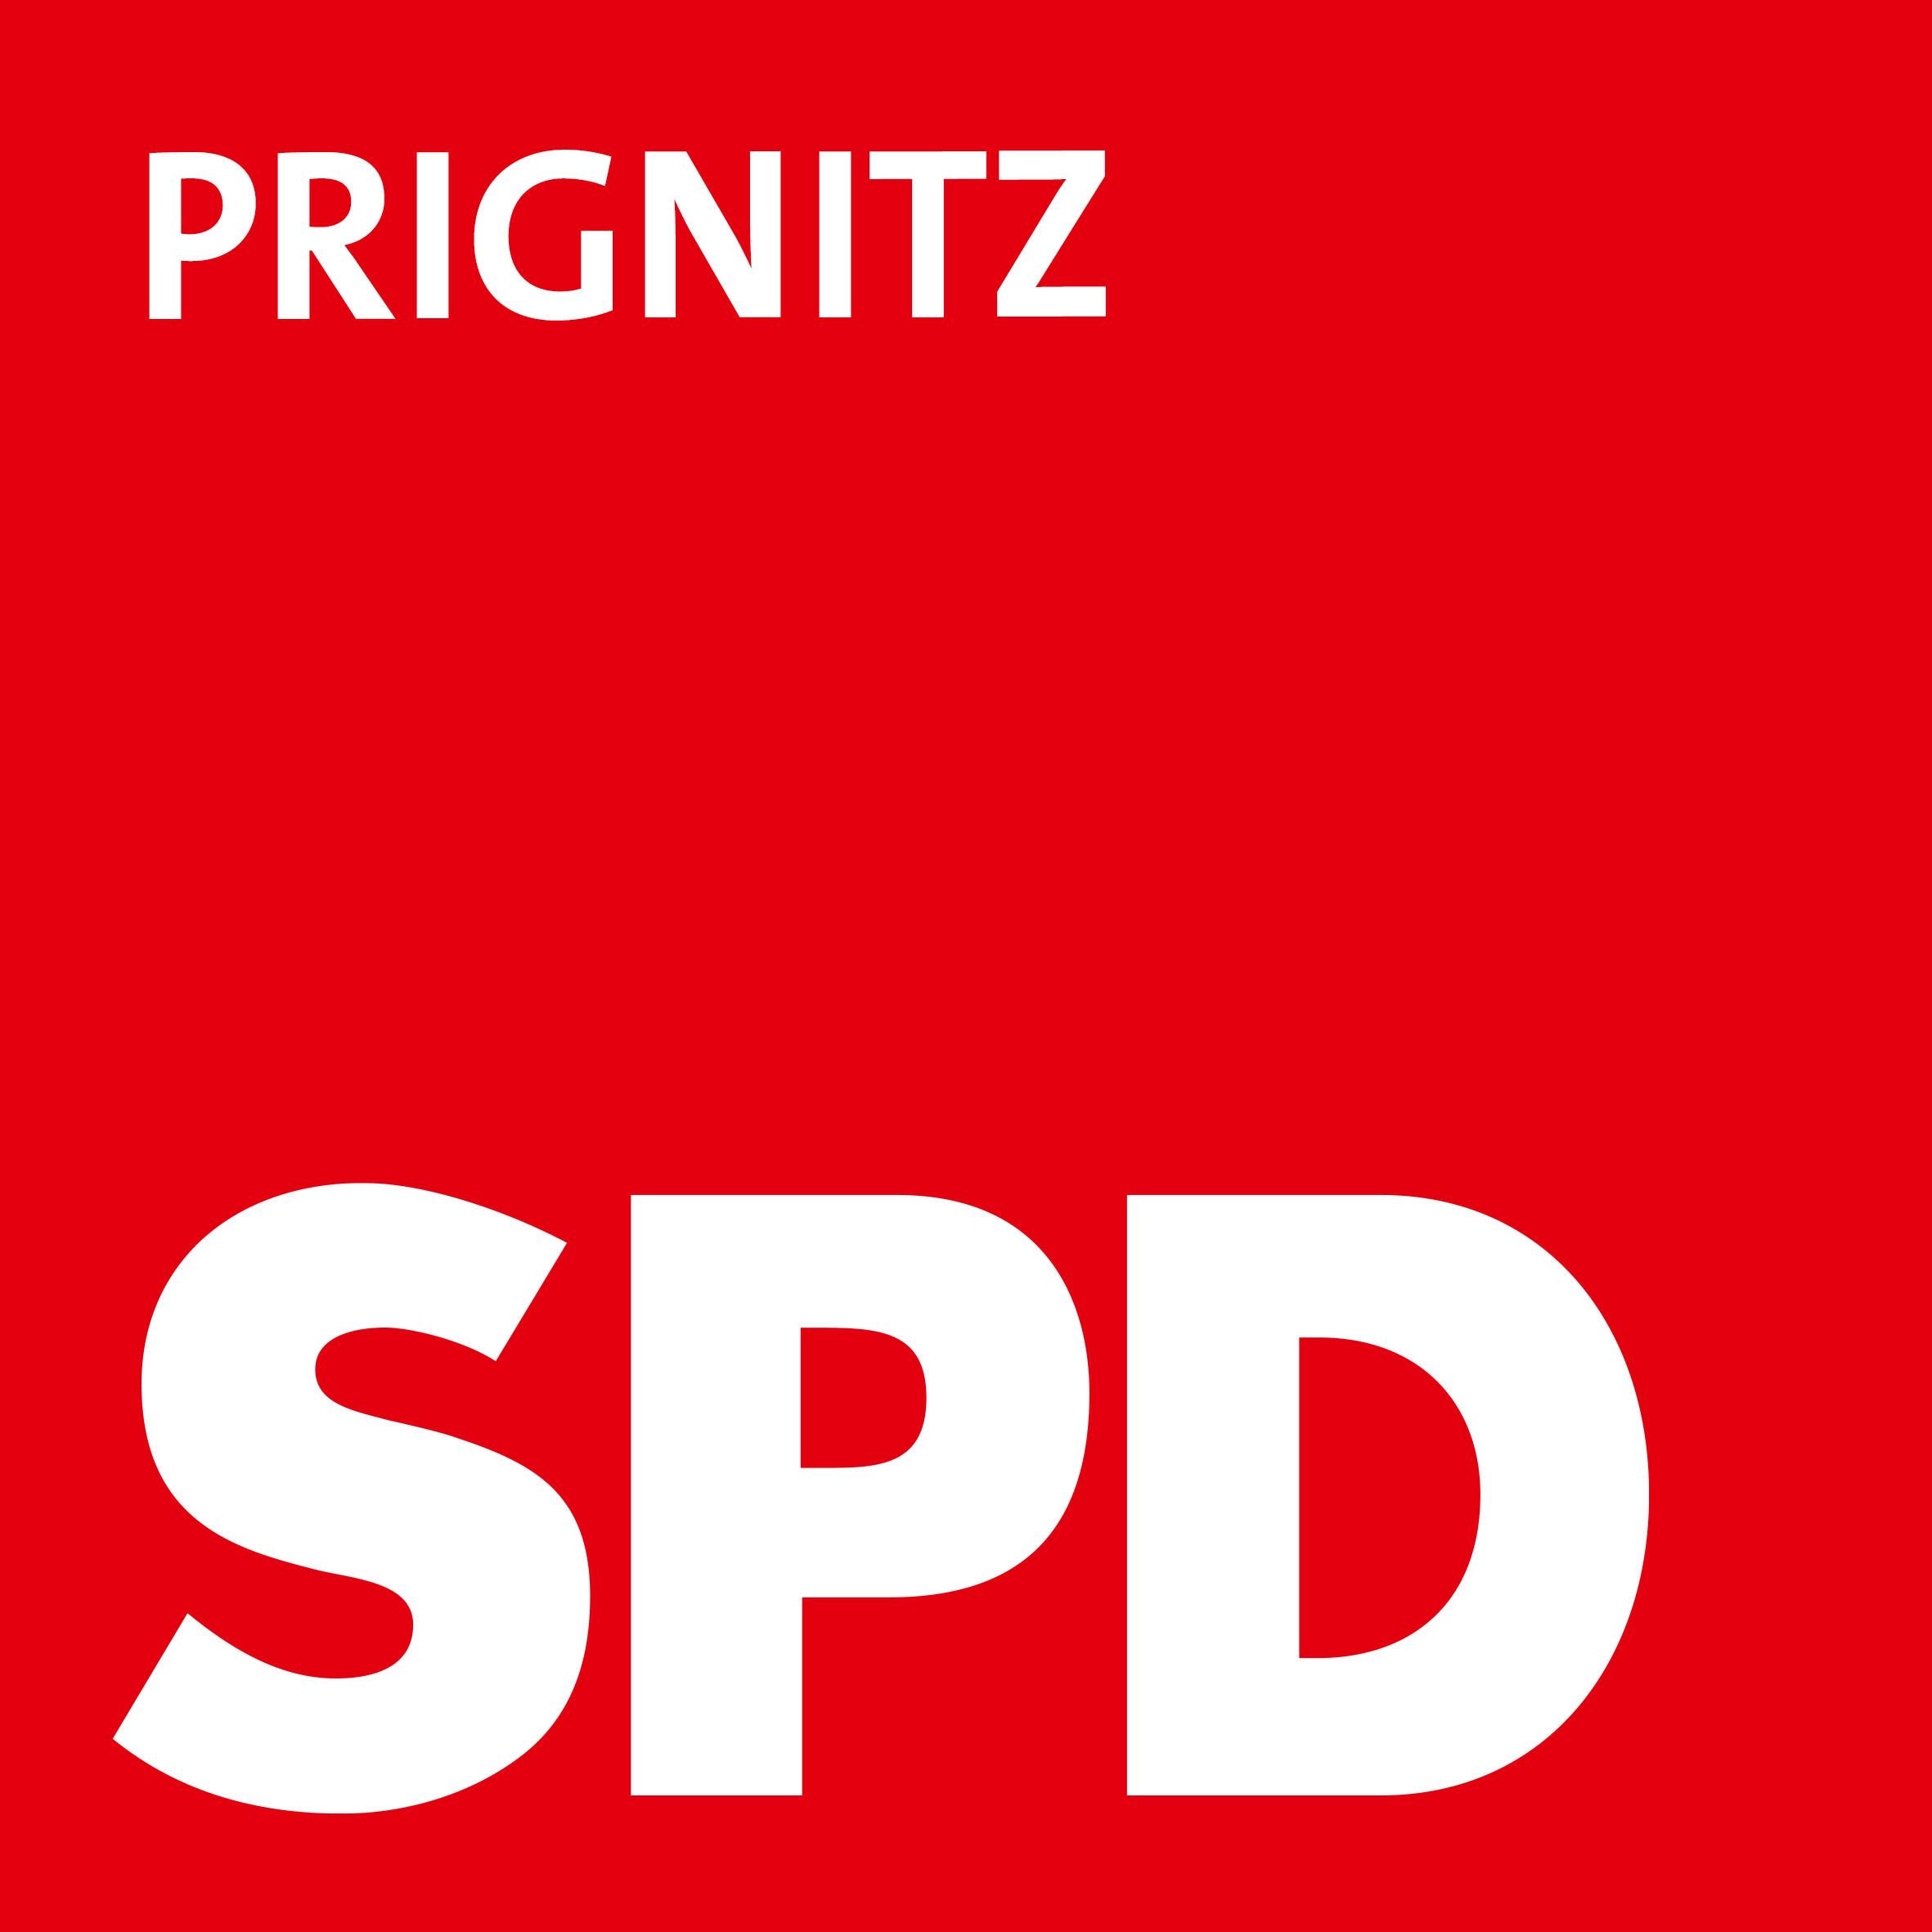 SPD Prignitz